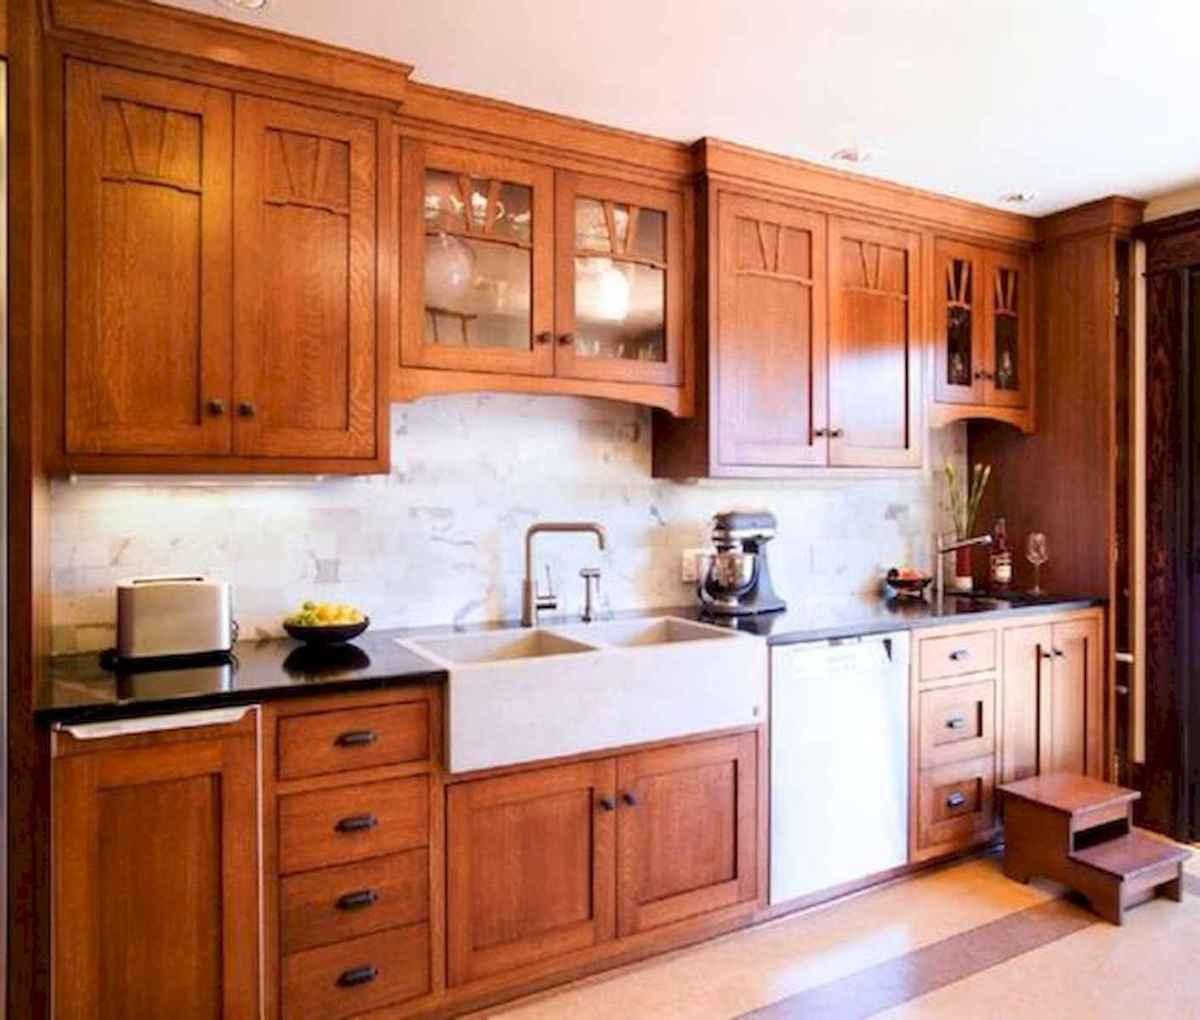 40 Awesome Craftsman Style Kitchen Design Ideas (37)